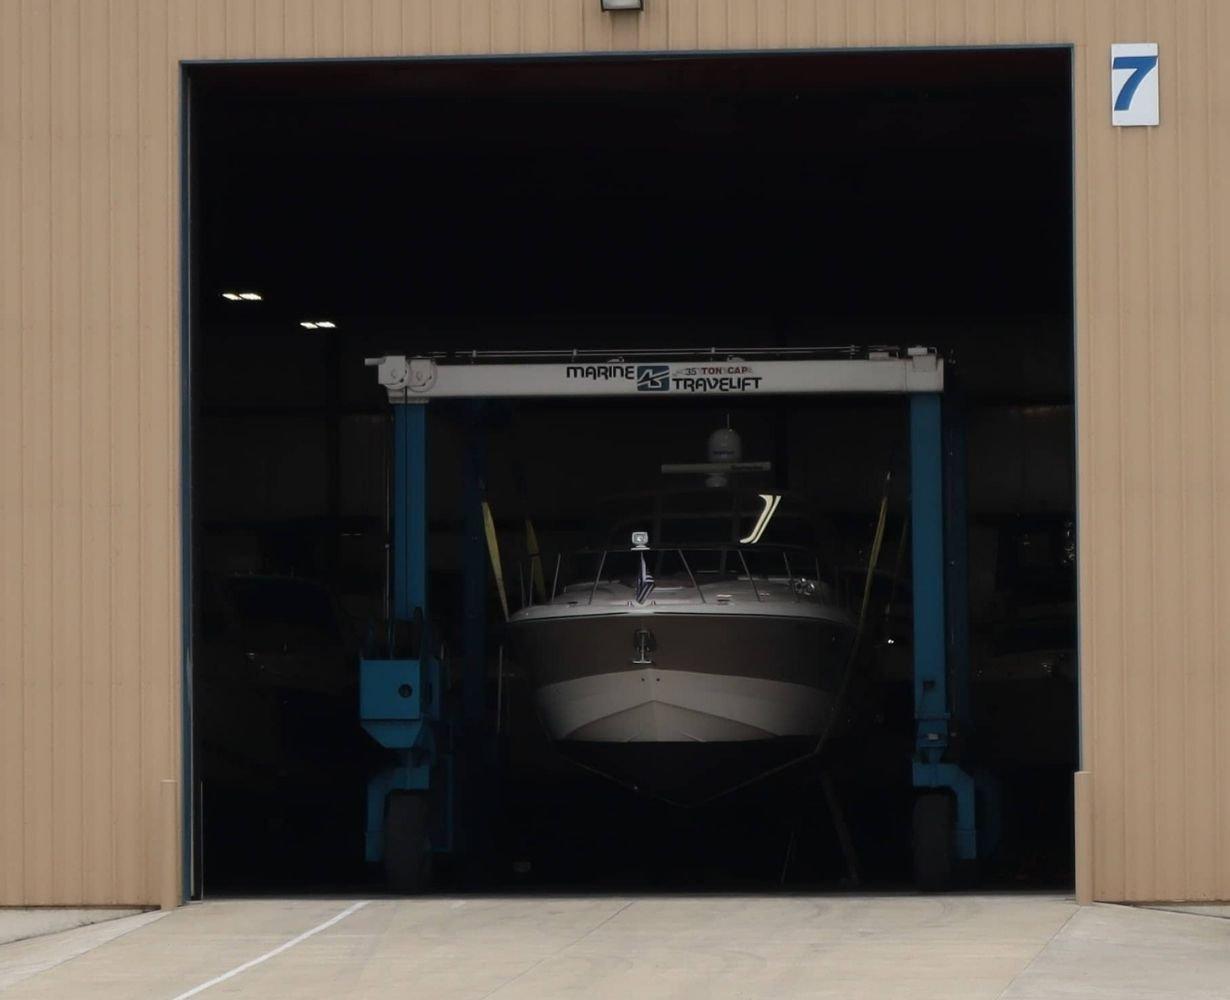 venetian-marina-sandusky-ohio-gallery-storage-2